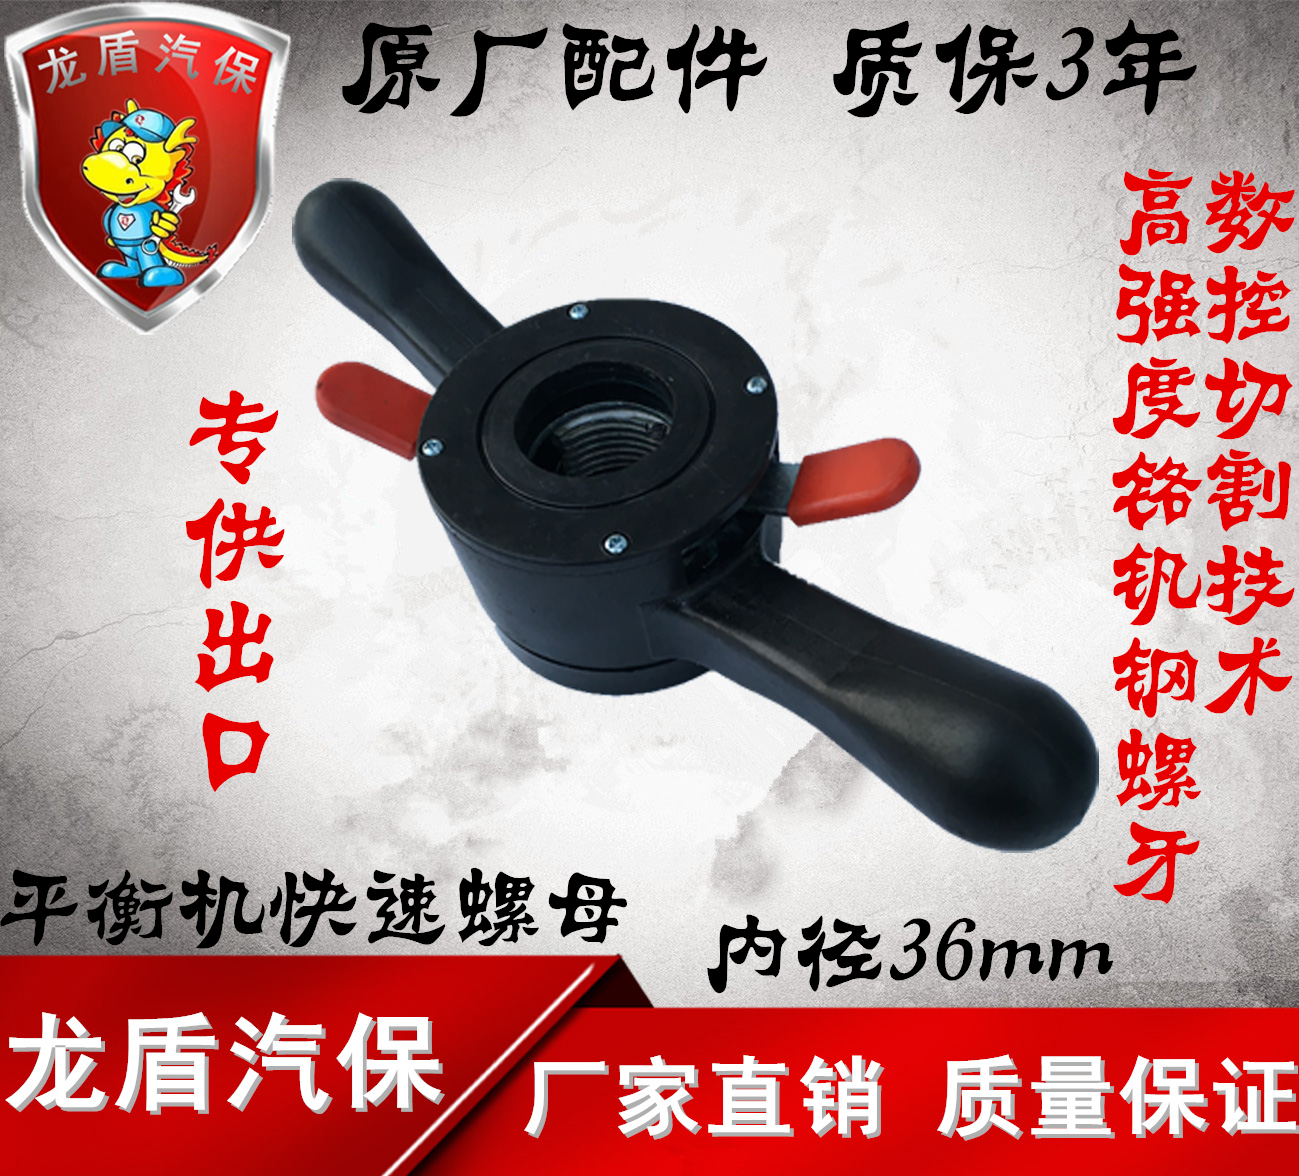 Шина шаг баланс инструмент баланс машина оснащена модель баланс машинально быстро гайка внутренний диаметр 36mm запереть плотно шина гайка выход